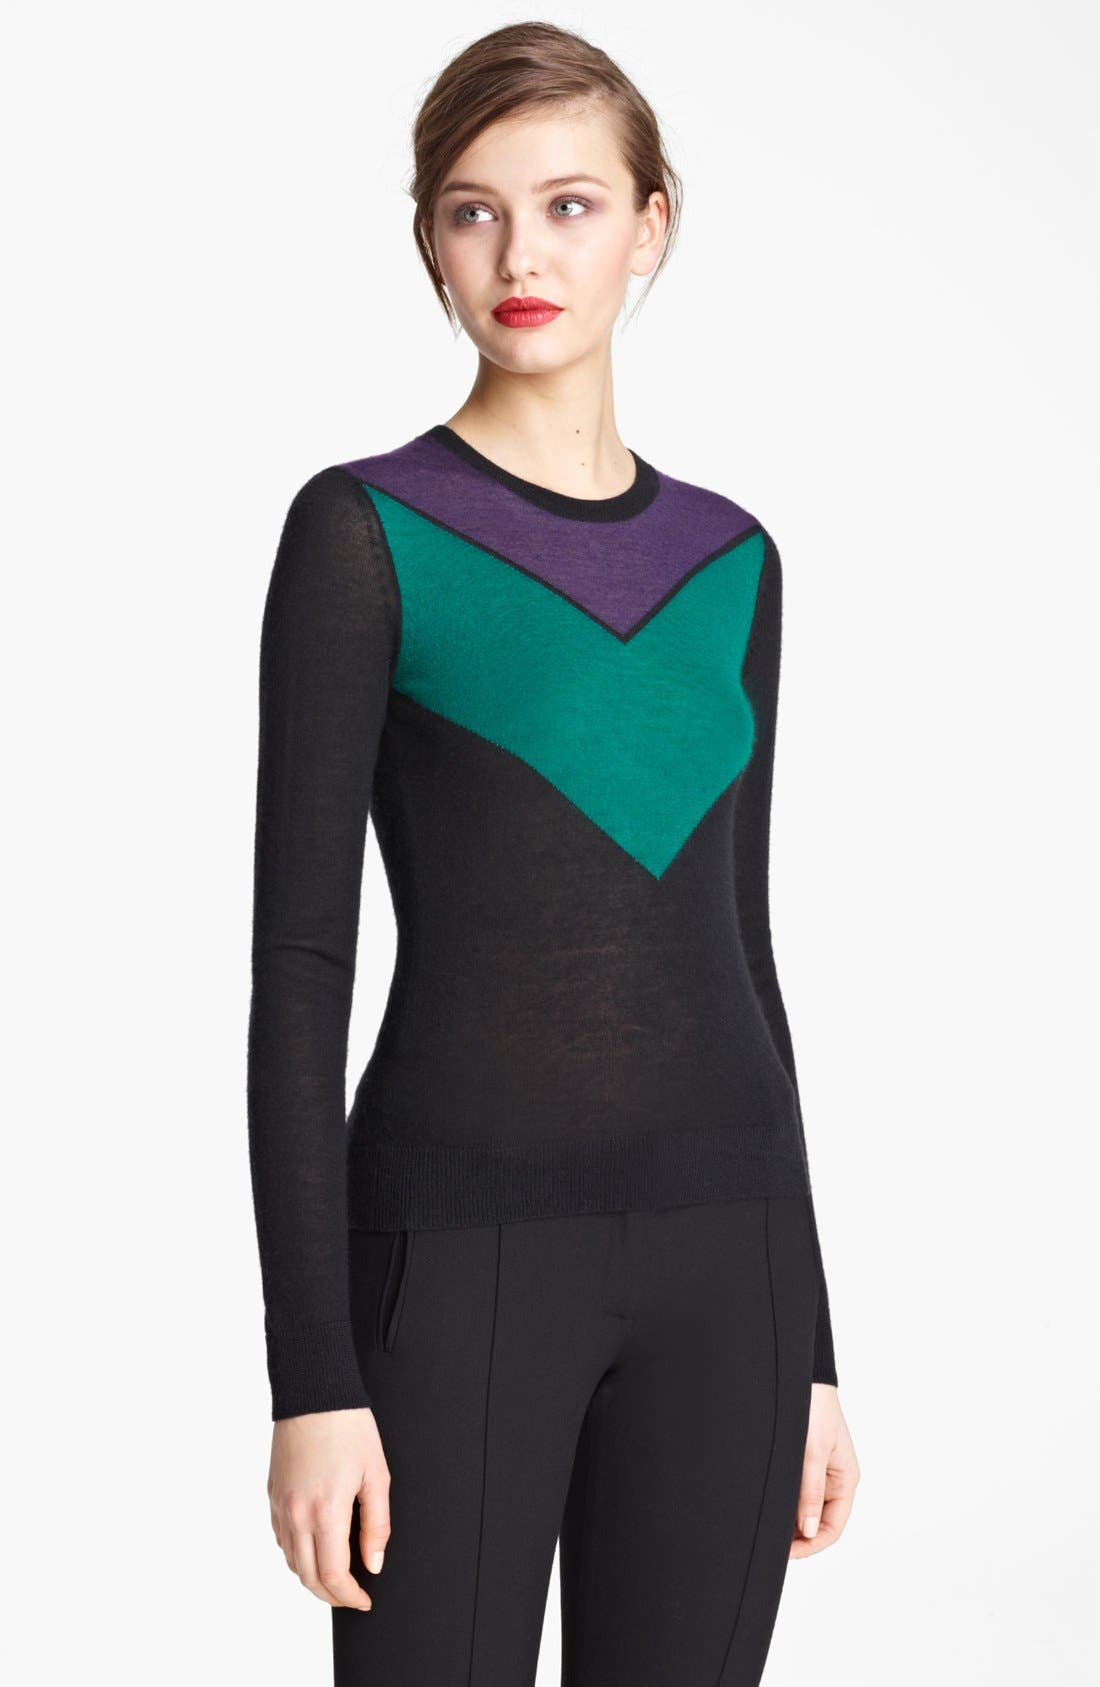 Alternate Image 1 Selected - Jason Wu Chevron Cashmere & Silk Sweater